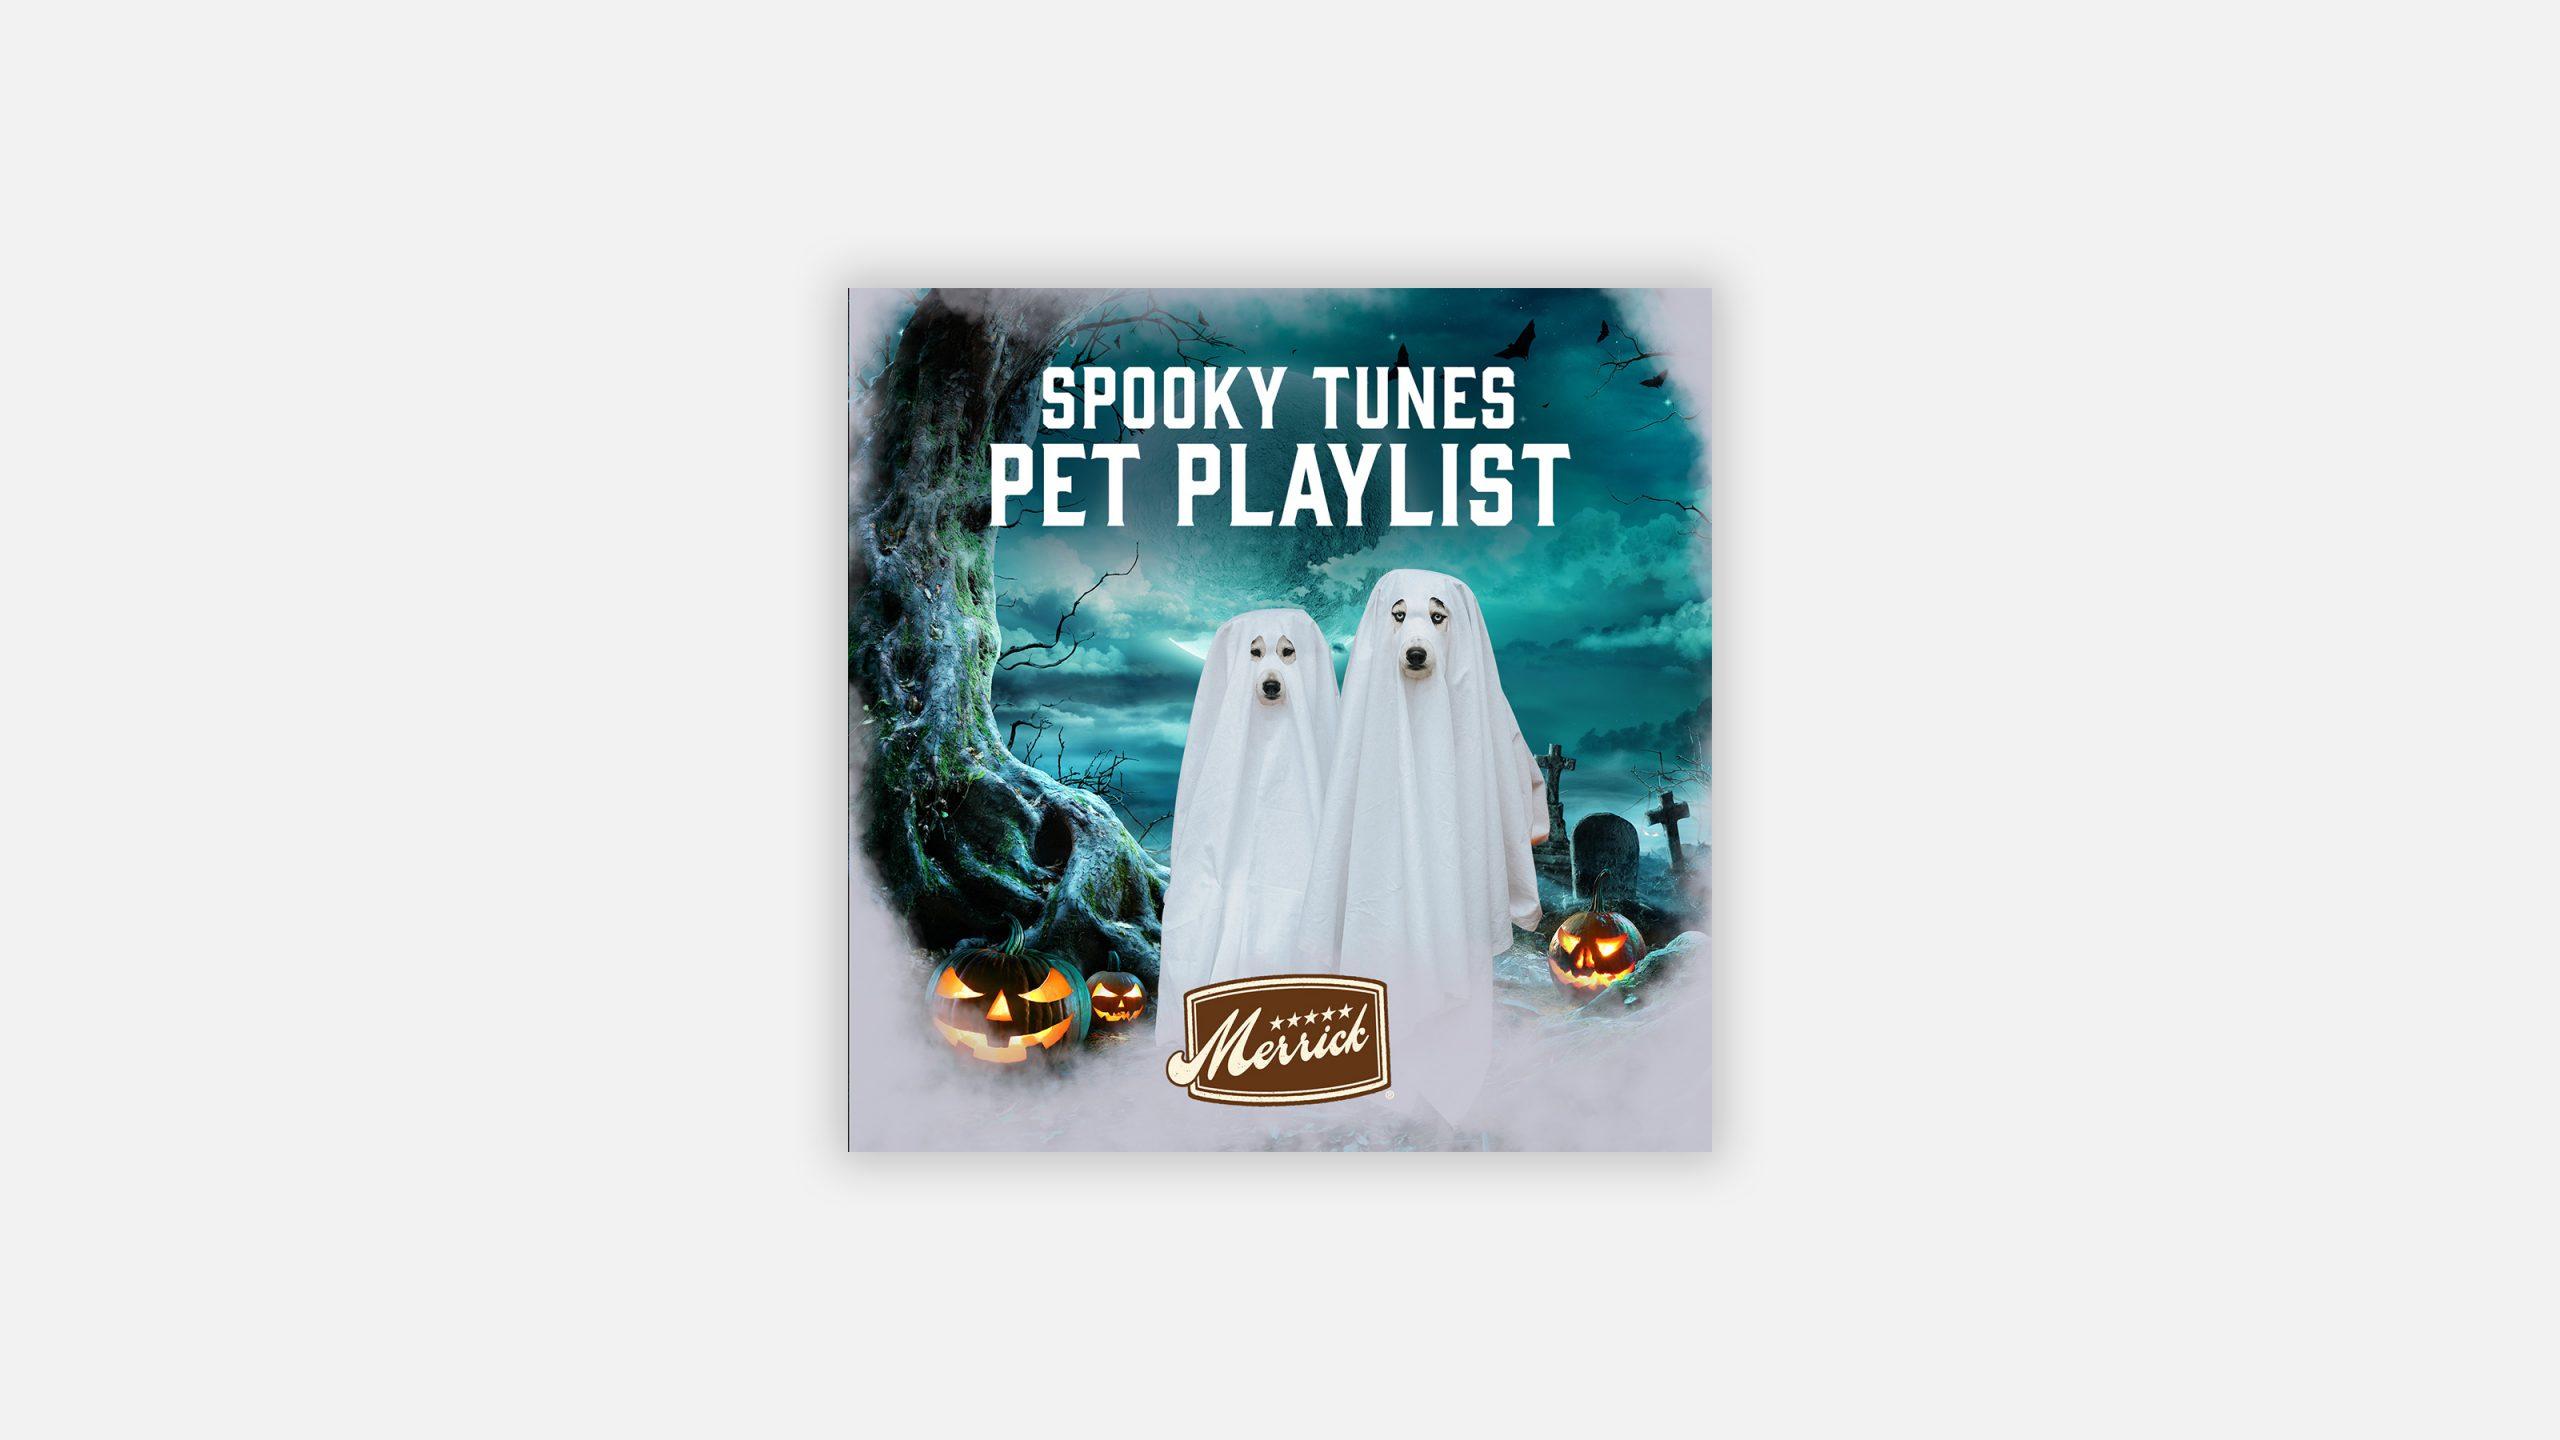 Merrick Spotify Playlist